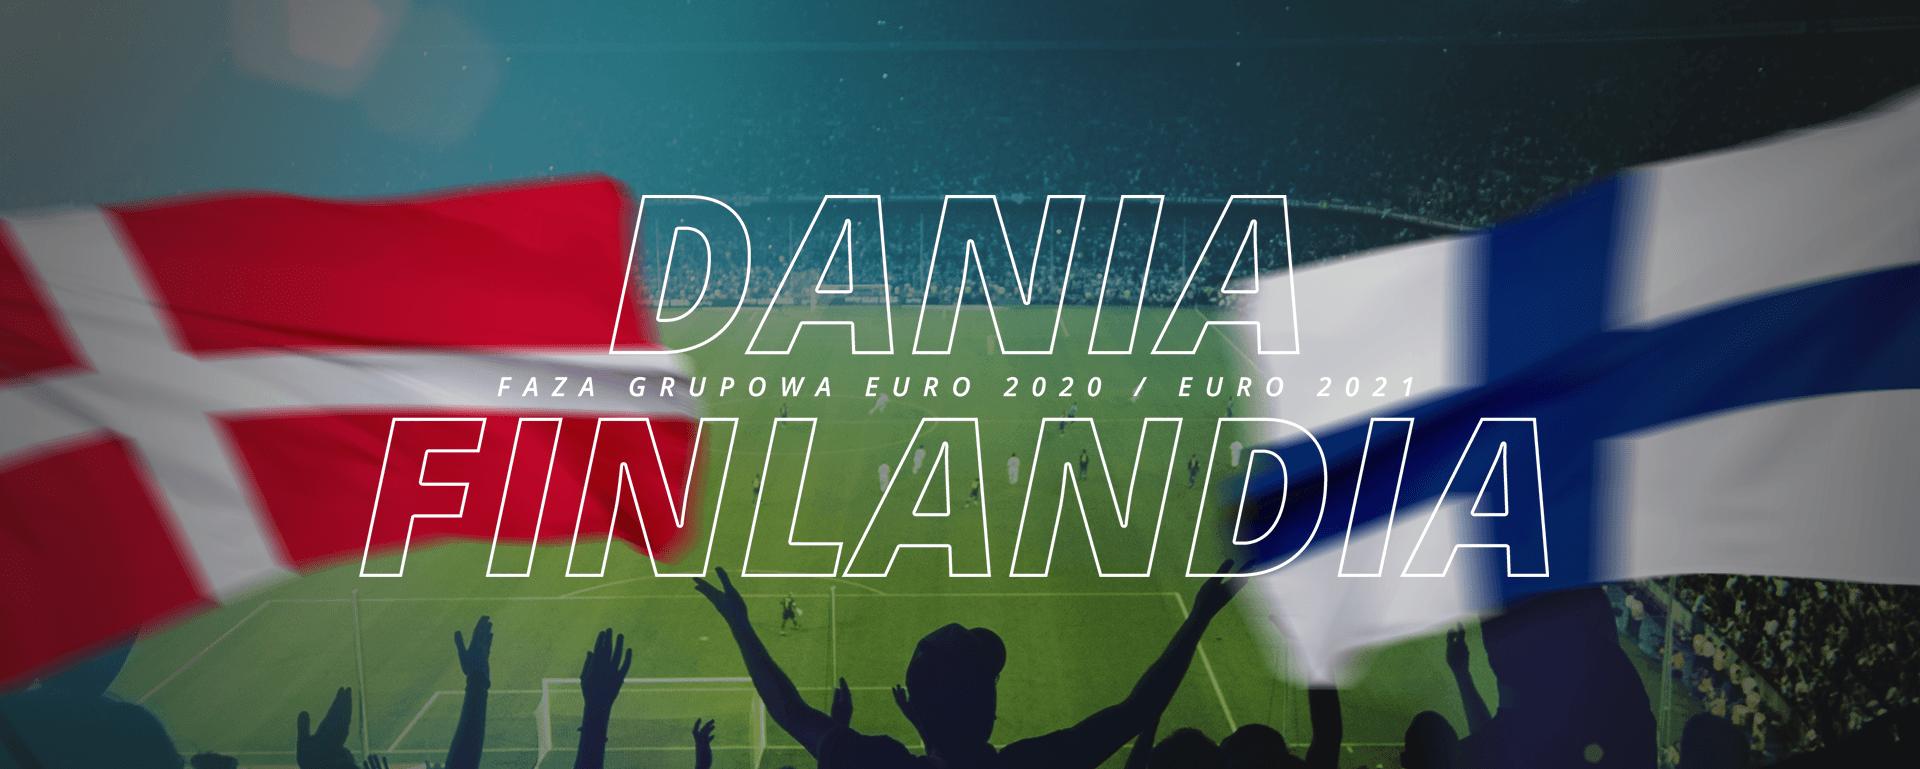 Dania – Finlandia | faza grupowa Euro 2020 / Euro 2021